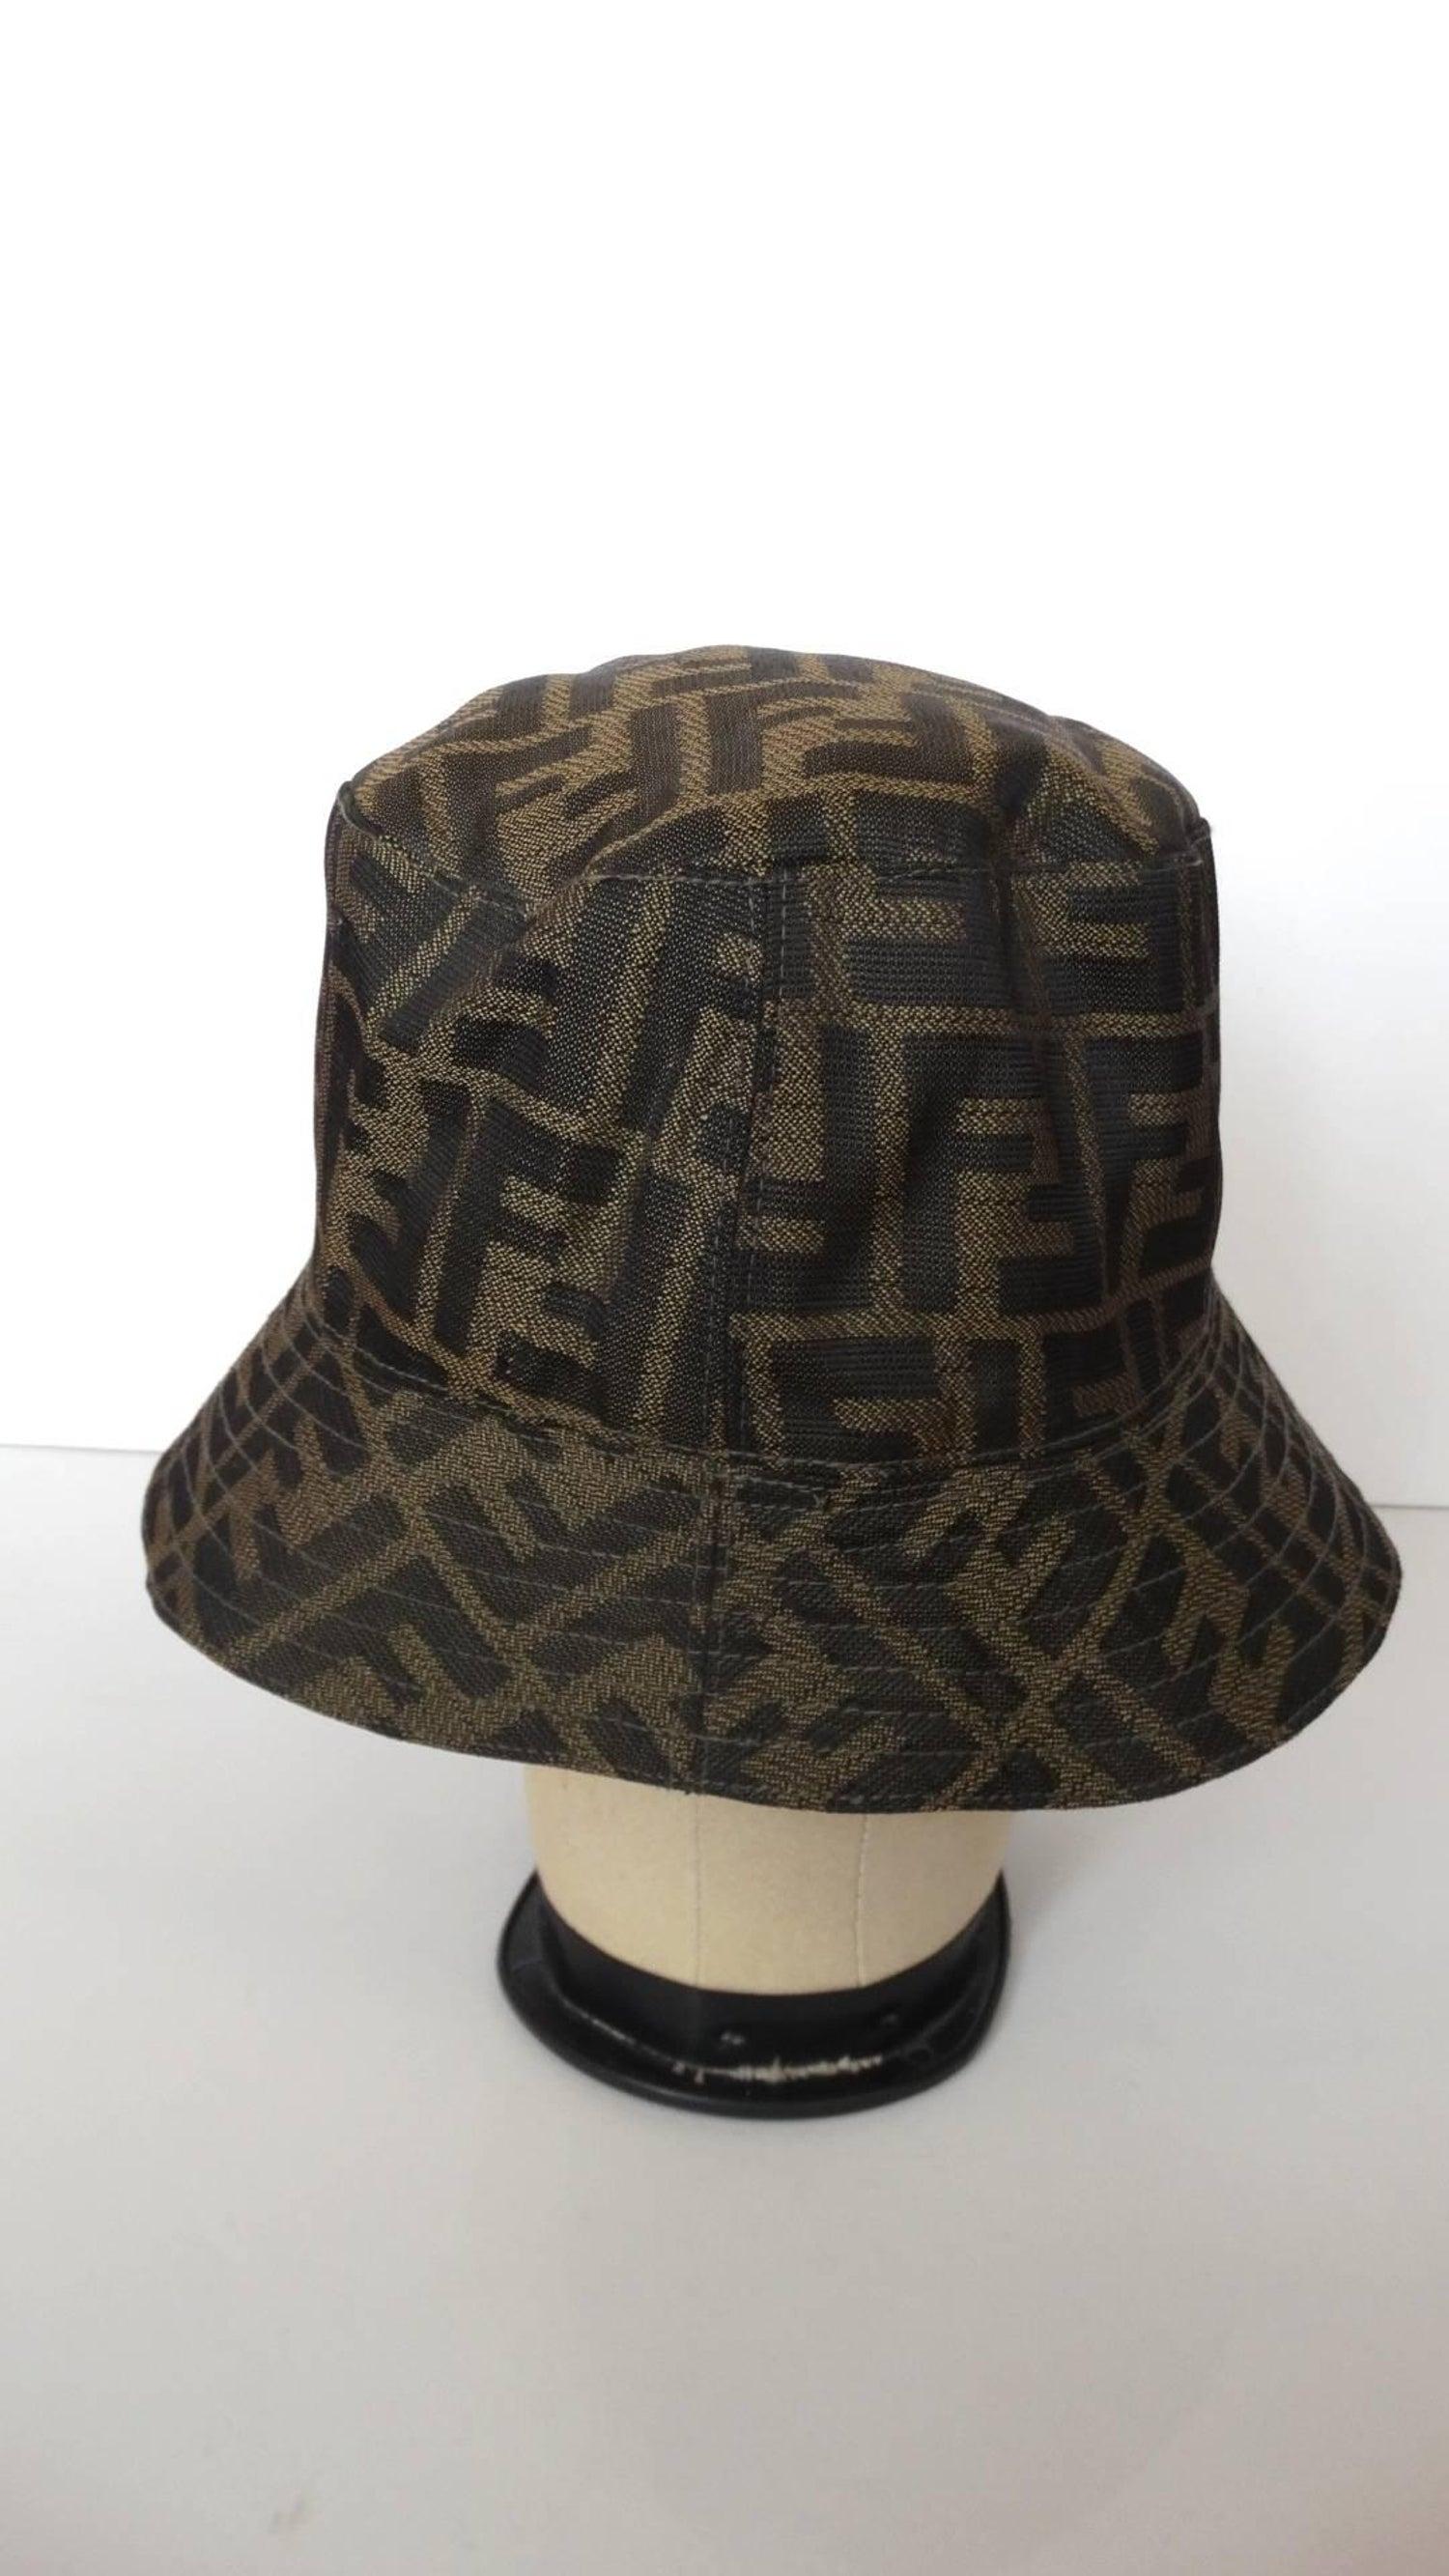 62c51ca6b37a 1990s Fendi Zucca Monogram Bucket Hat at 1stdibs